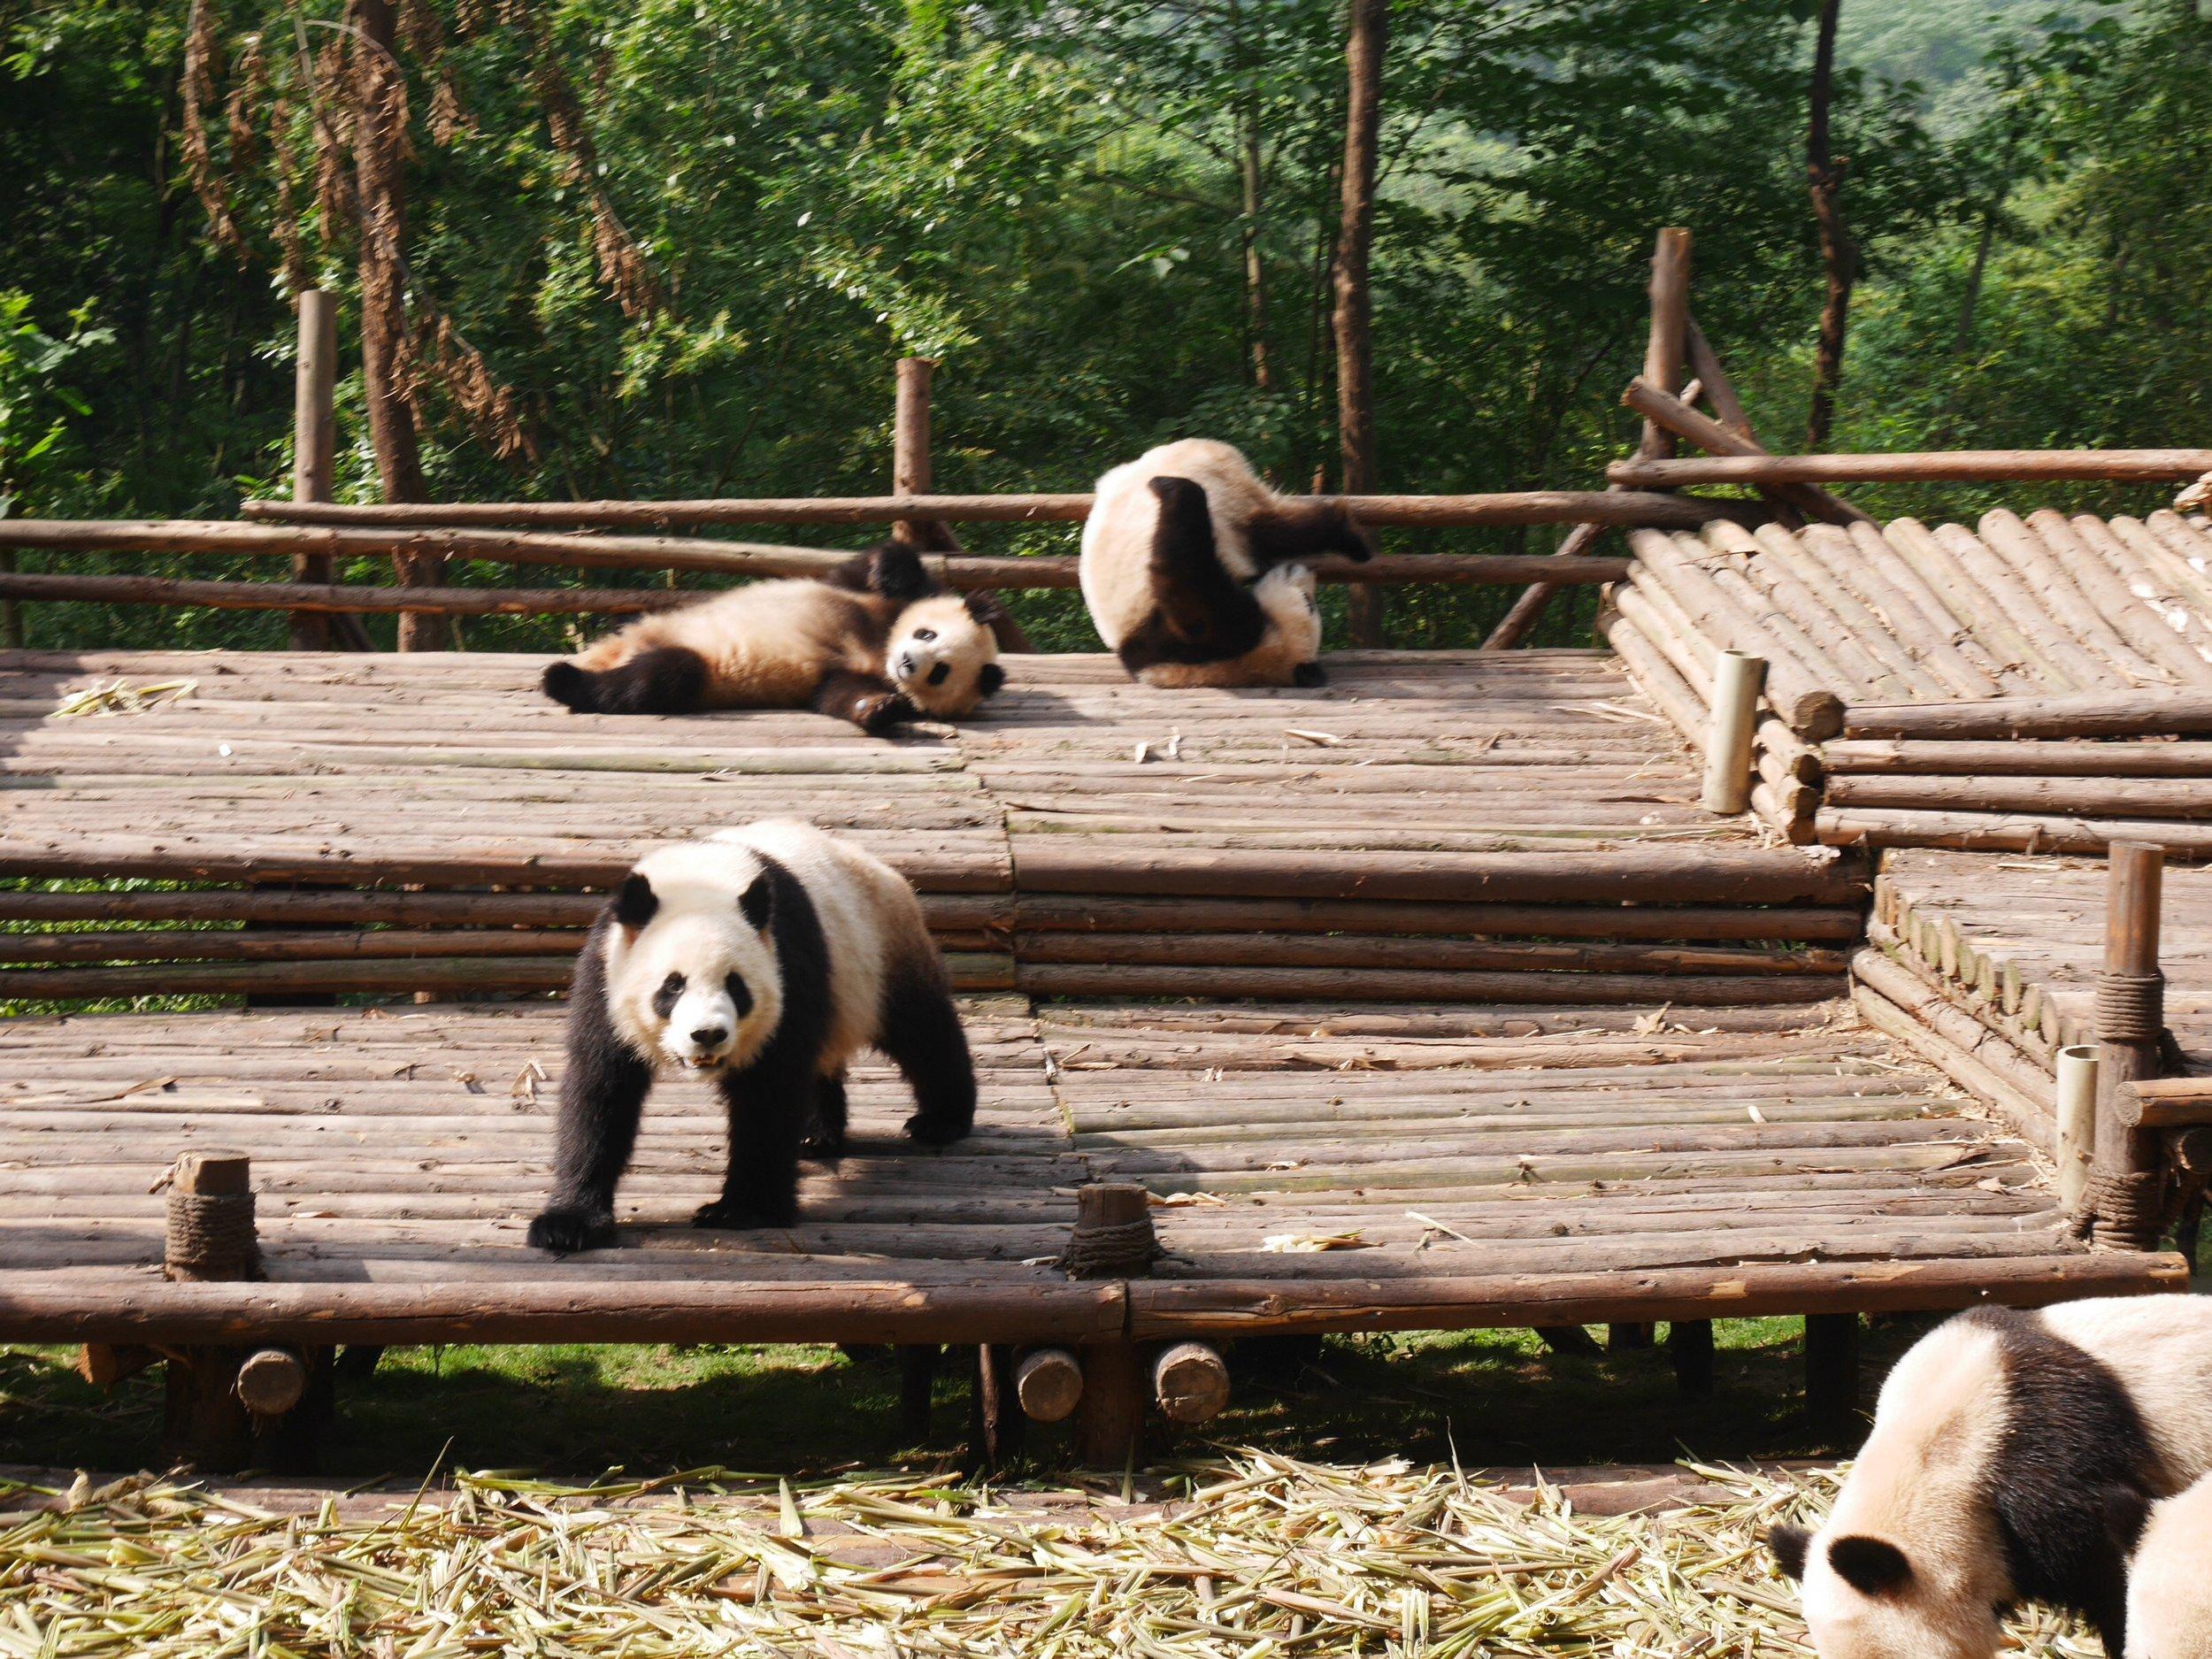 Pandas-1.jpg